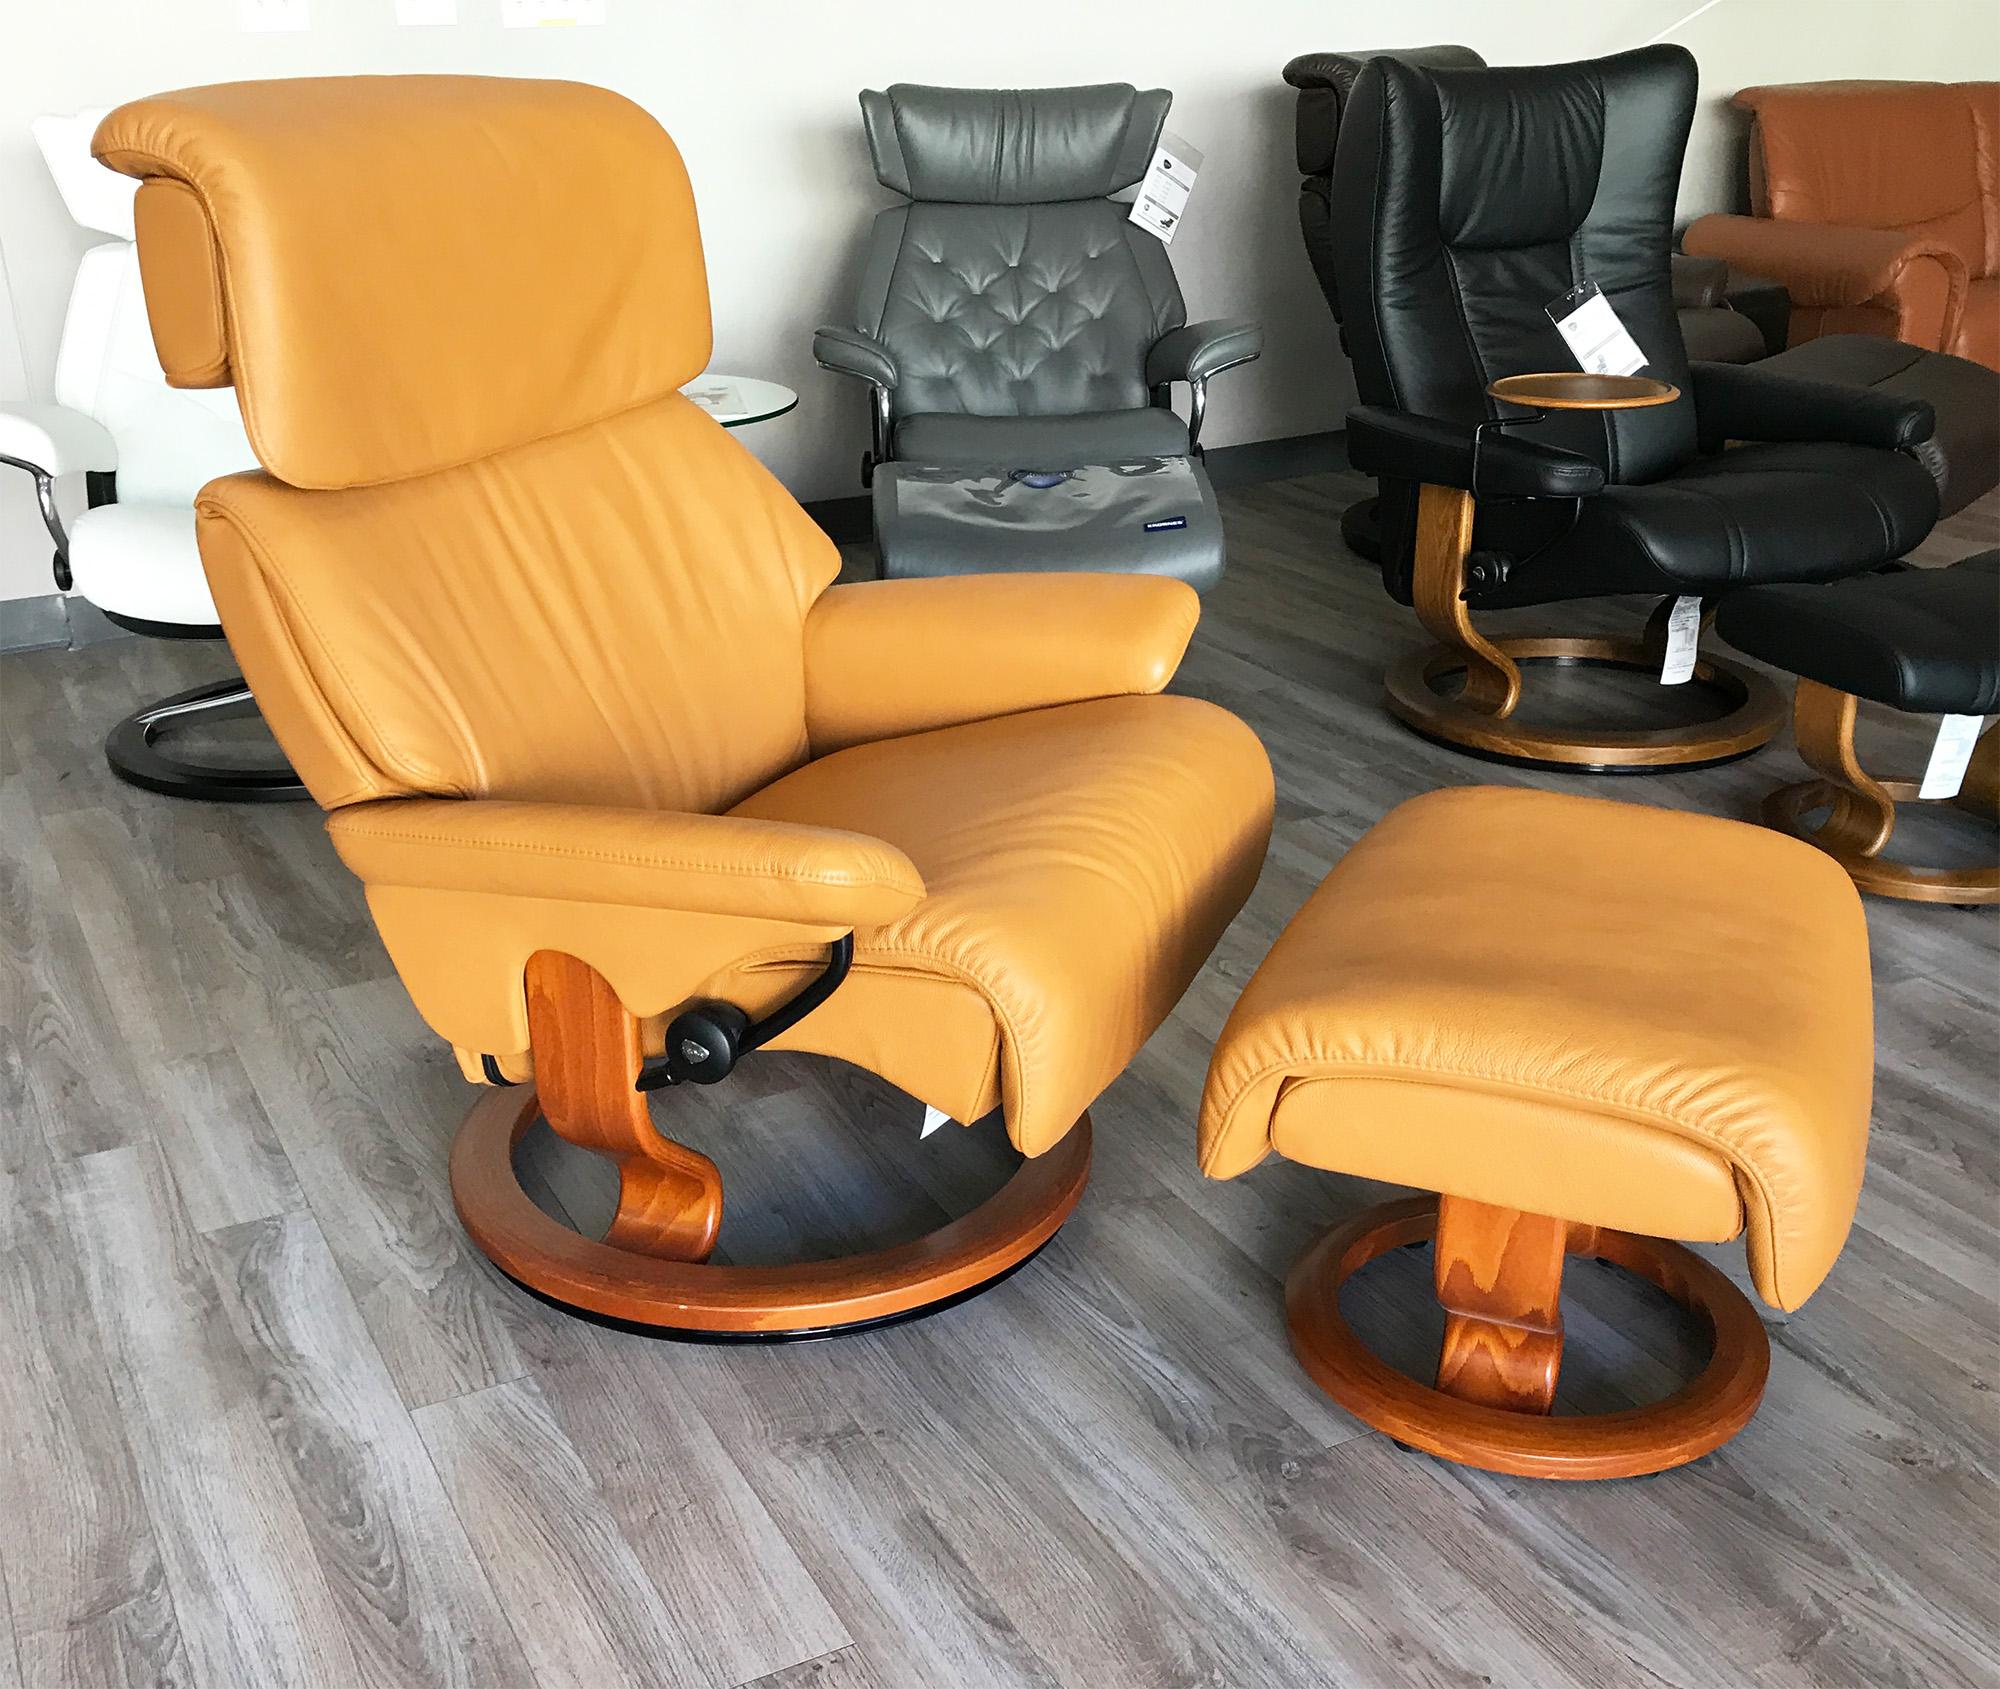 Cool Stressless Spirit Large Dream Cori Tan Leather Recliner Chair And Ottoman By Ekornes Lamtechconsult Wood Chair Design Ideas Lamtechconsultcom